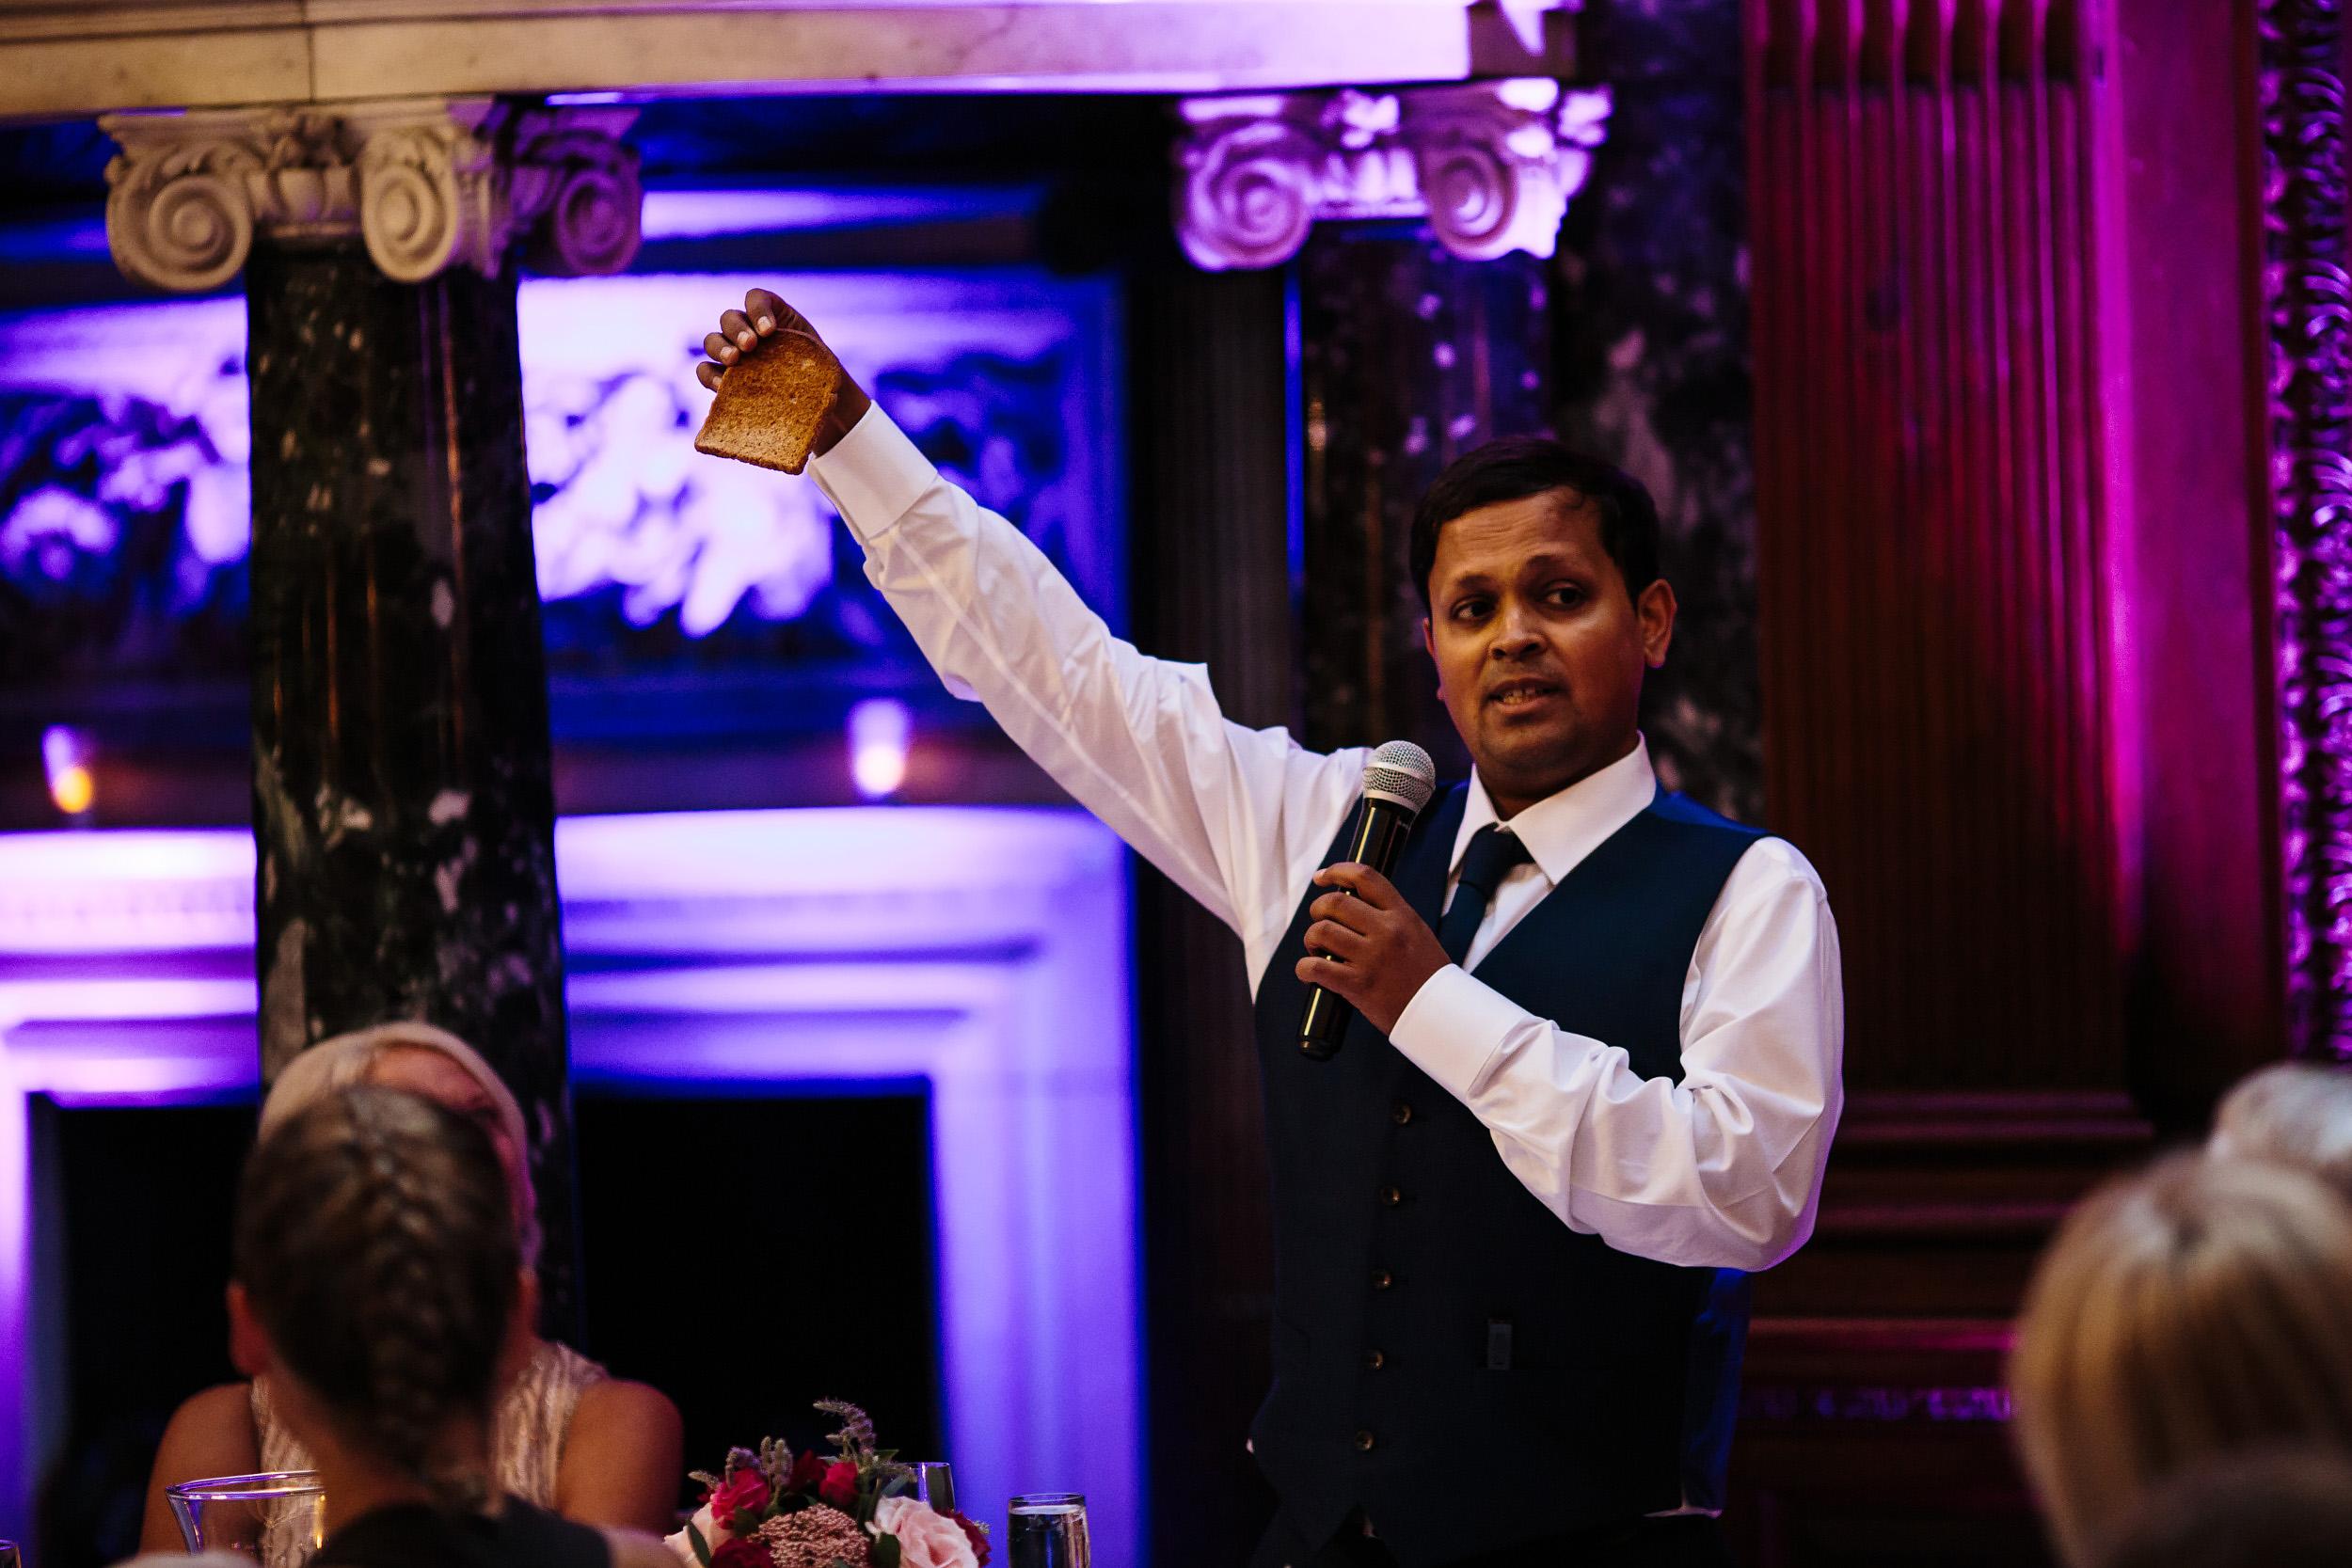 Best man raises a toast during his wedding speech